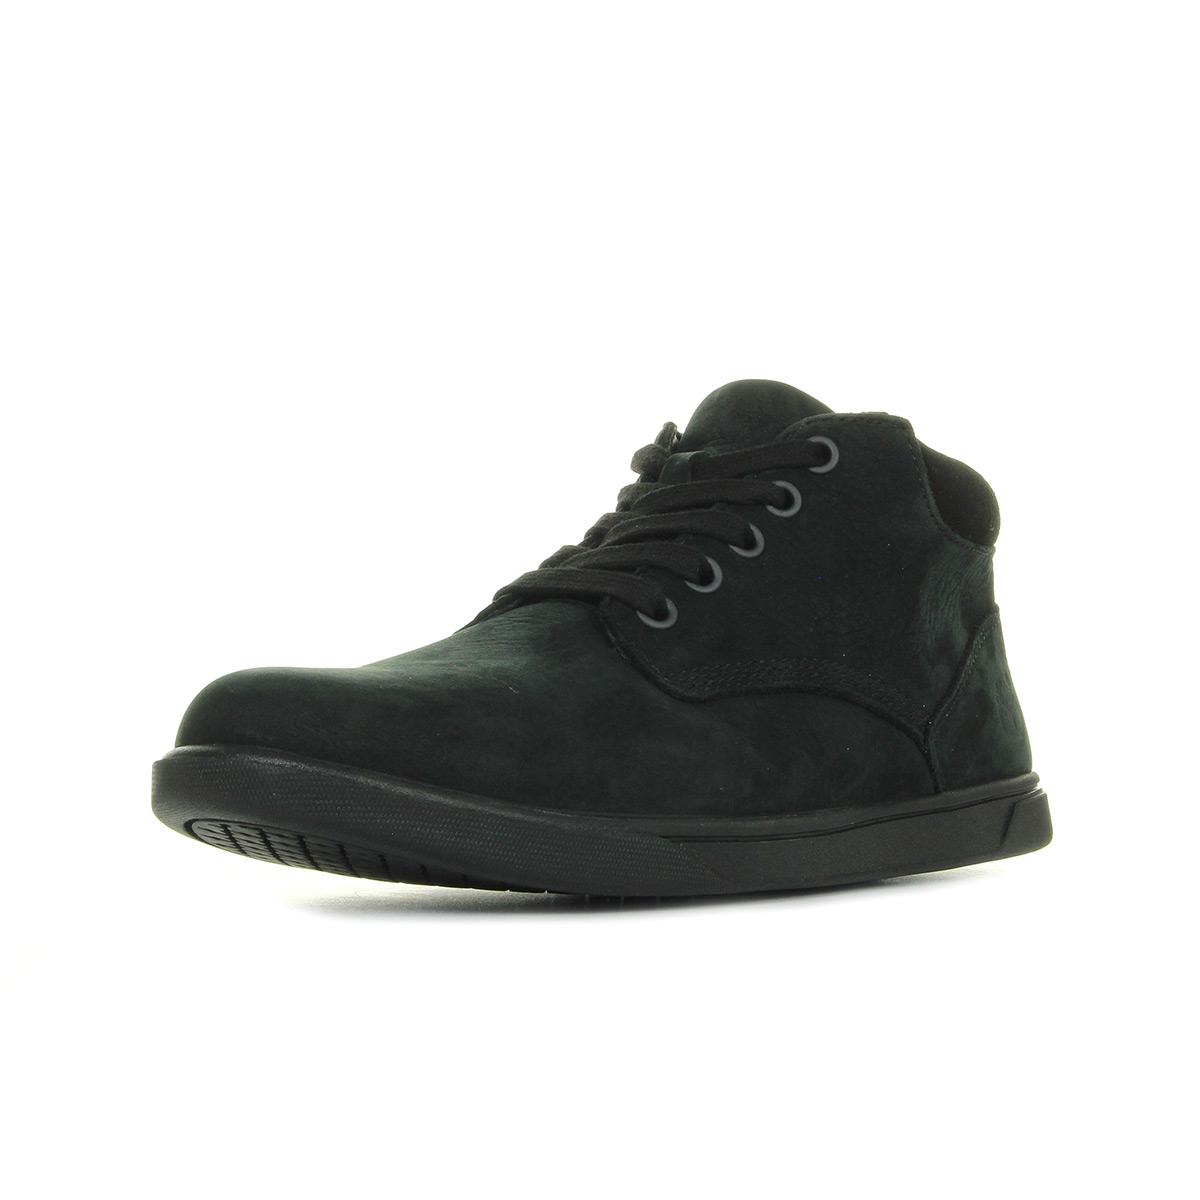 Bottes Timberland Groveton Leather Chukka Black 42s5nb